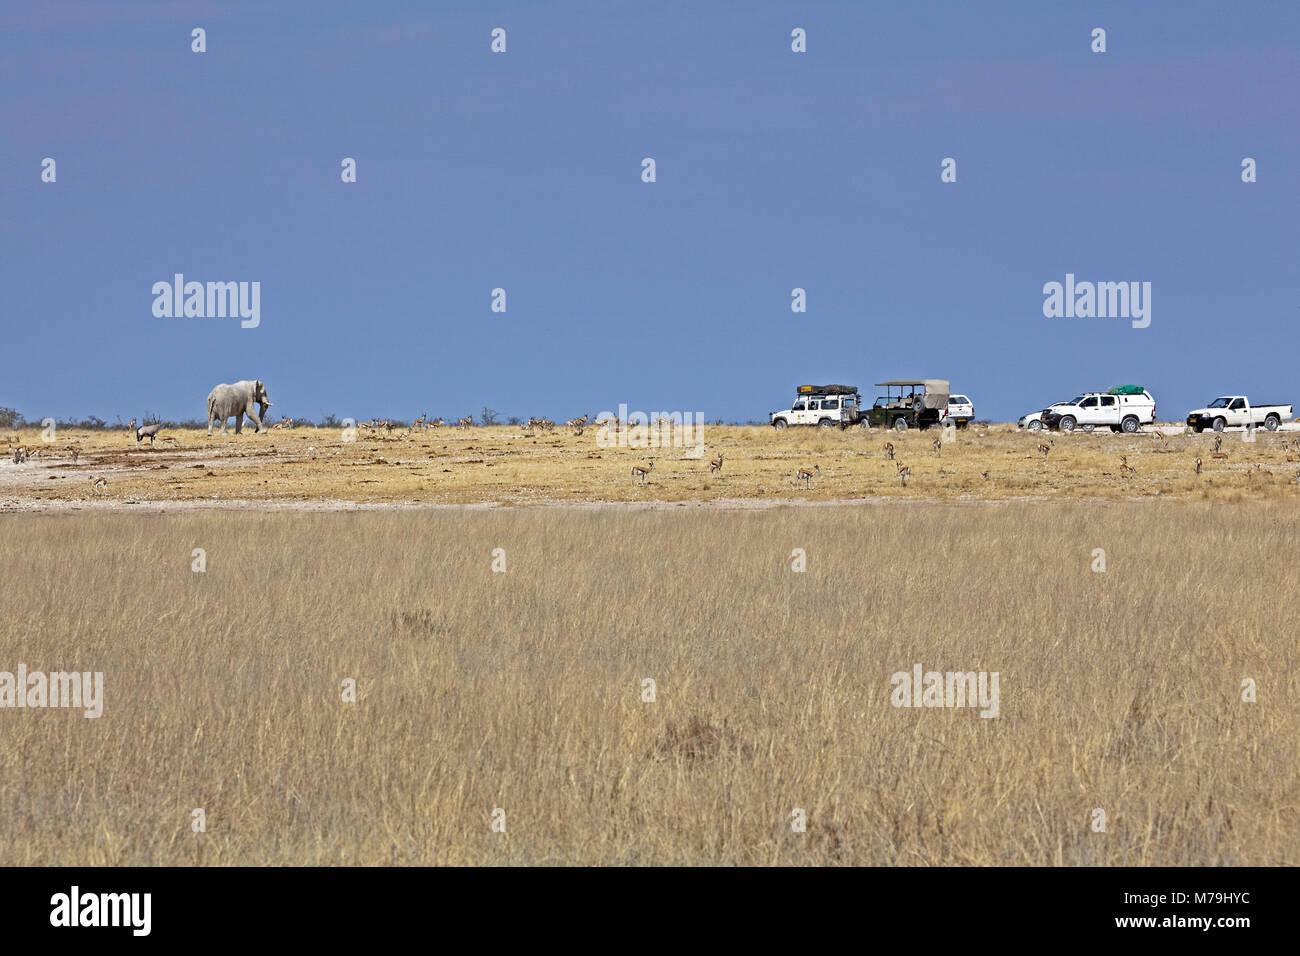 Africa, South-West Africa, Namibia, Etoscha National Park, elephant, Oryx antelops, jeep, Stock Photo